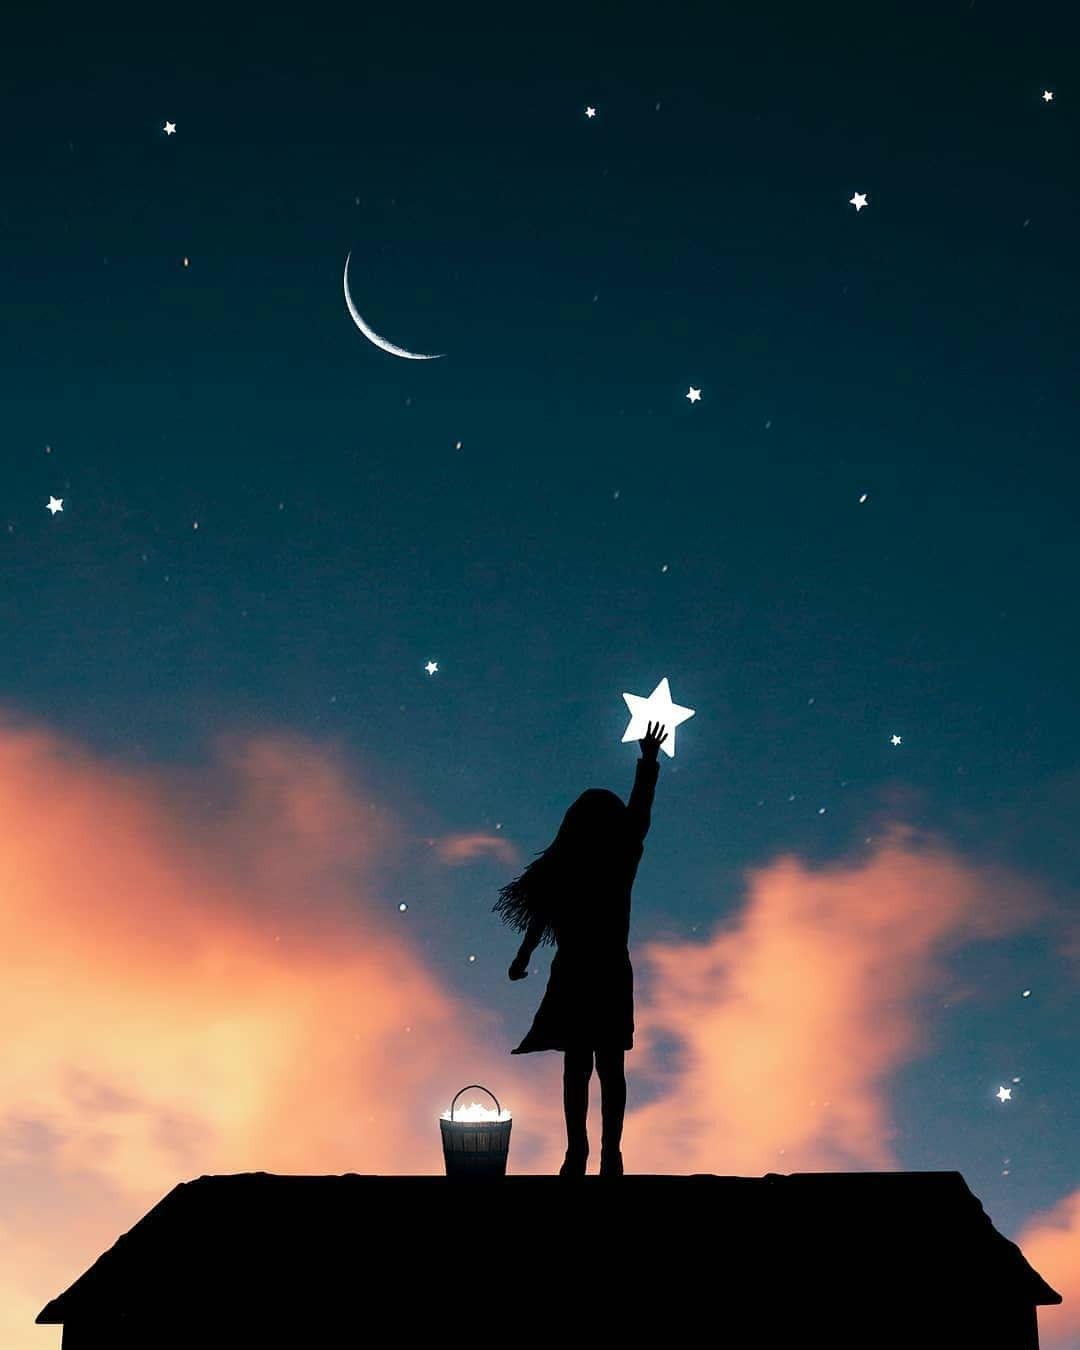 Pin By Melek Yahya On Dijital Fotografcilik Night Sky Art Sky Art Night Illustration